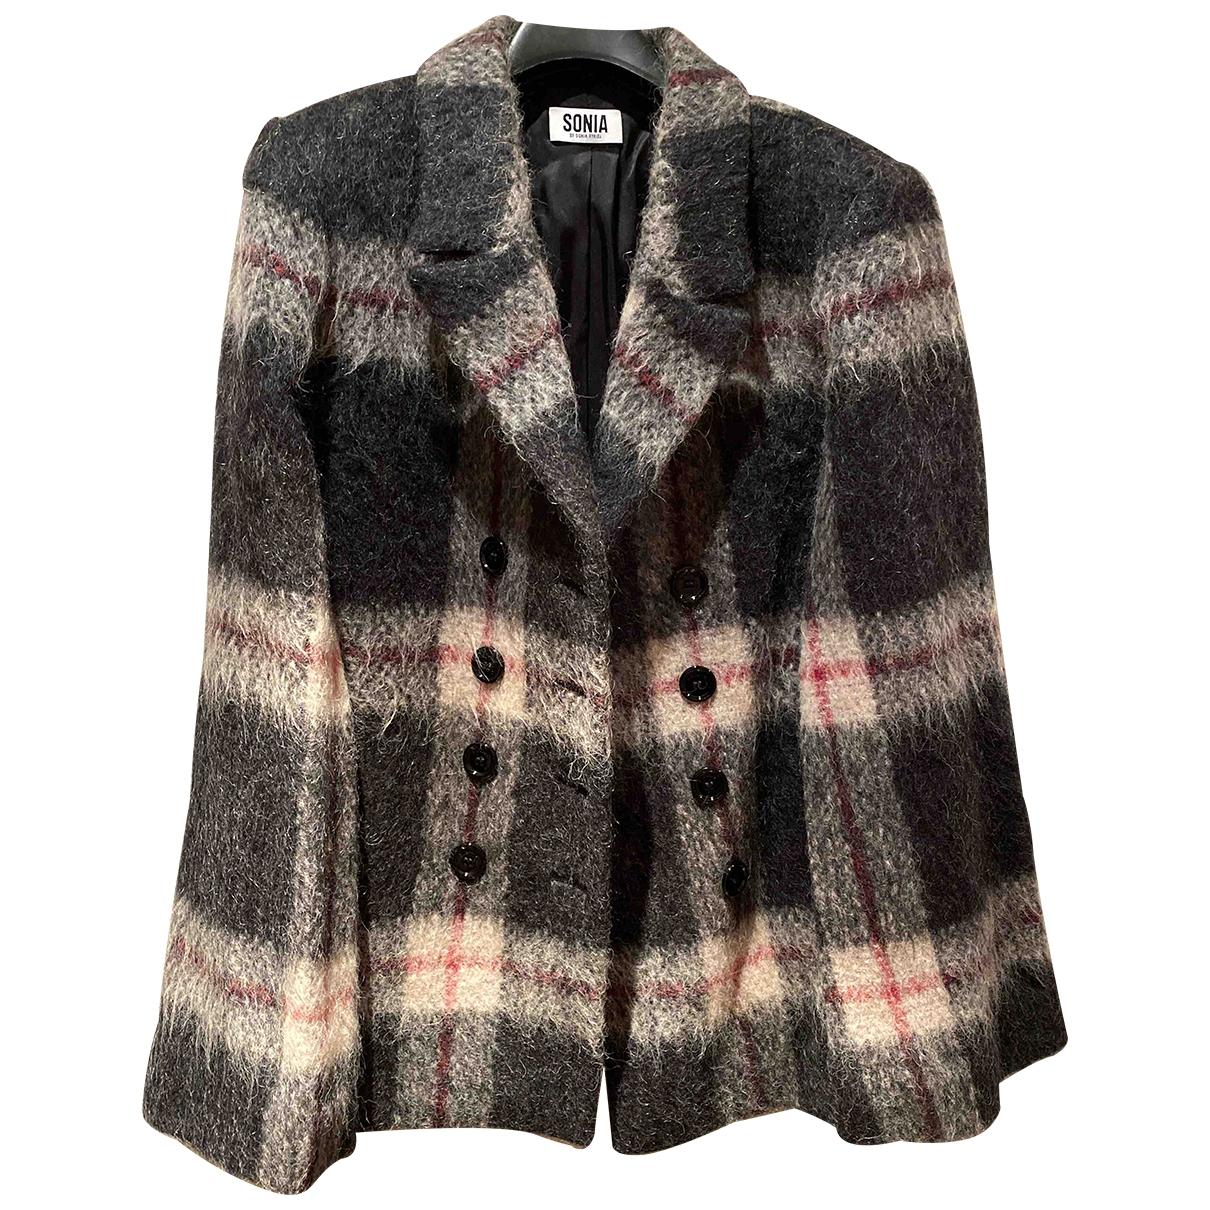 Sonia By Sonia Rykiel - Veste   pour femme en laine - anthracite